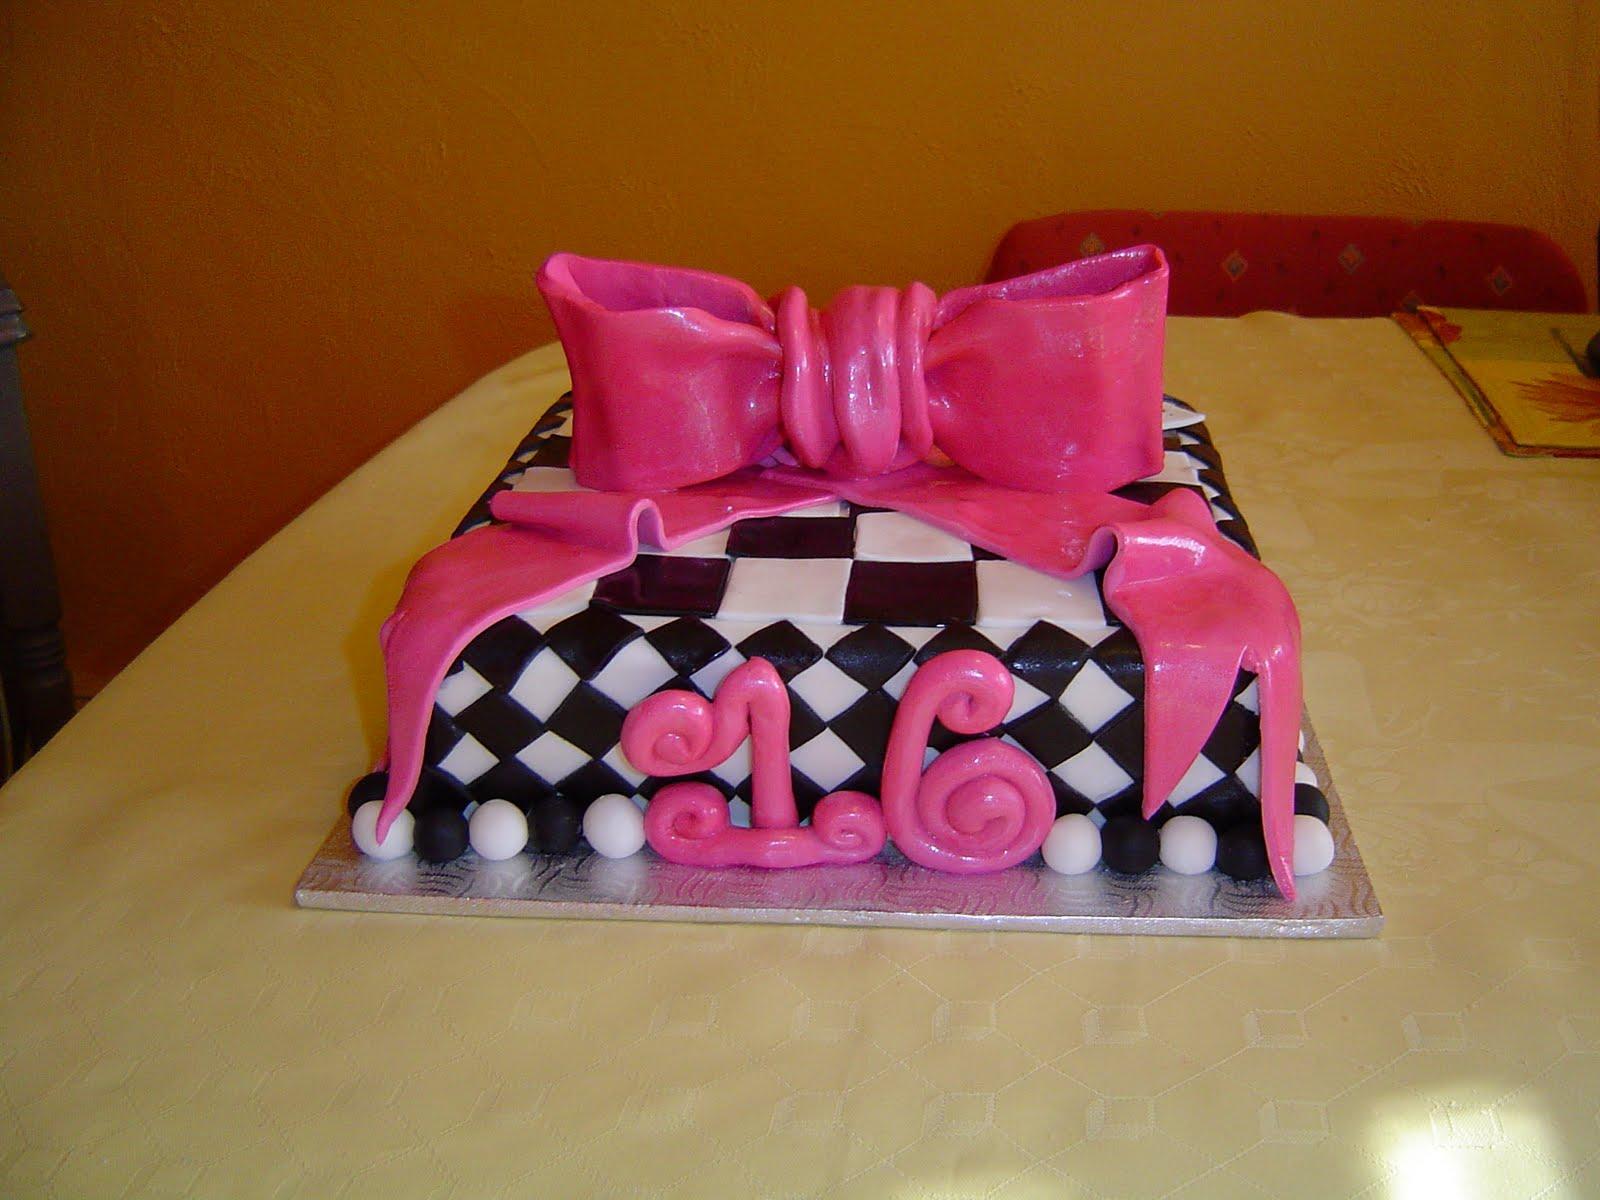 Pleasing Sweet 16 Cakes Decoration Ideas Little Birthday Cakes Funny Birthday Cards Online Alyptdamsfinfo